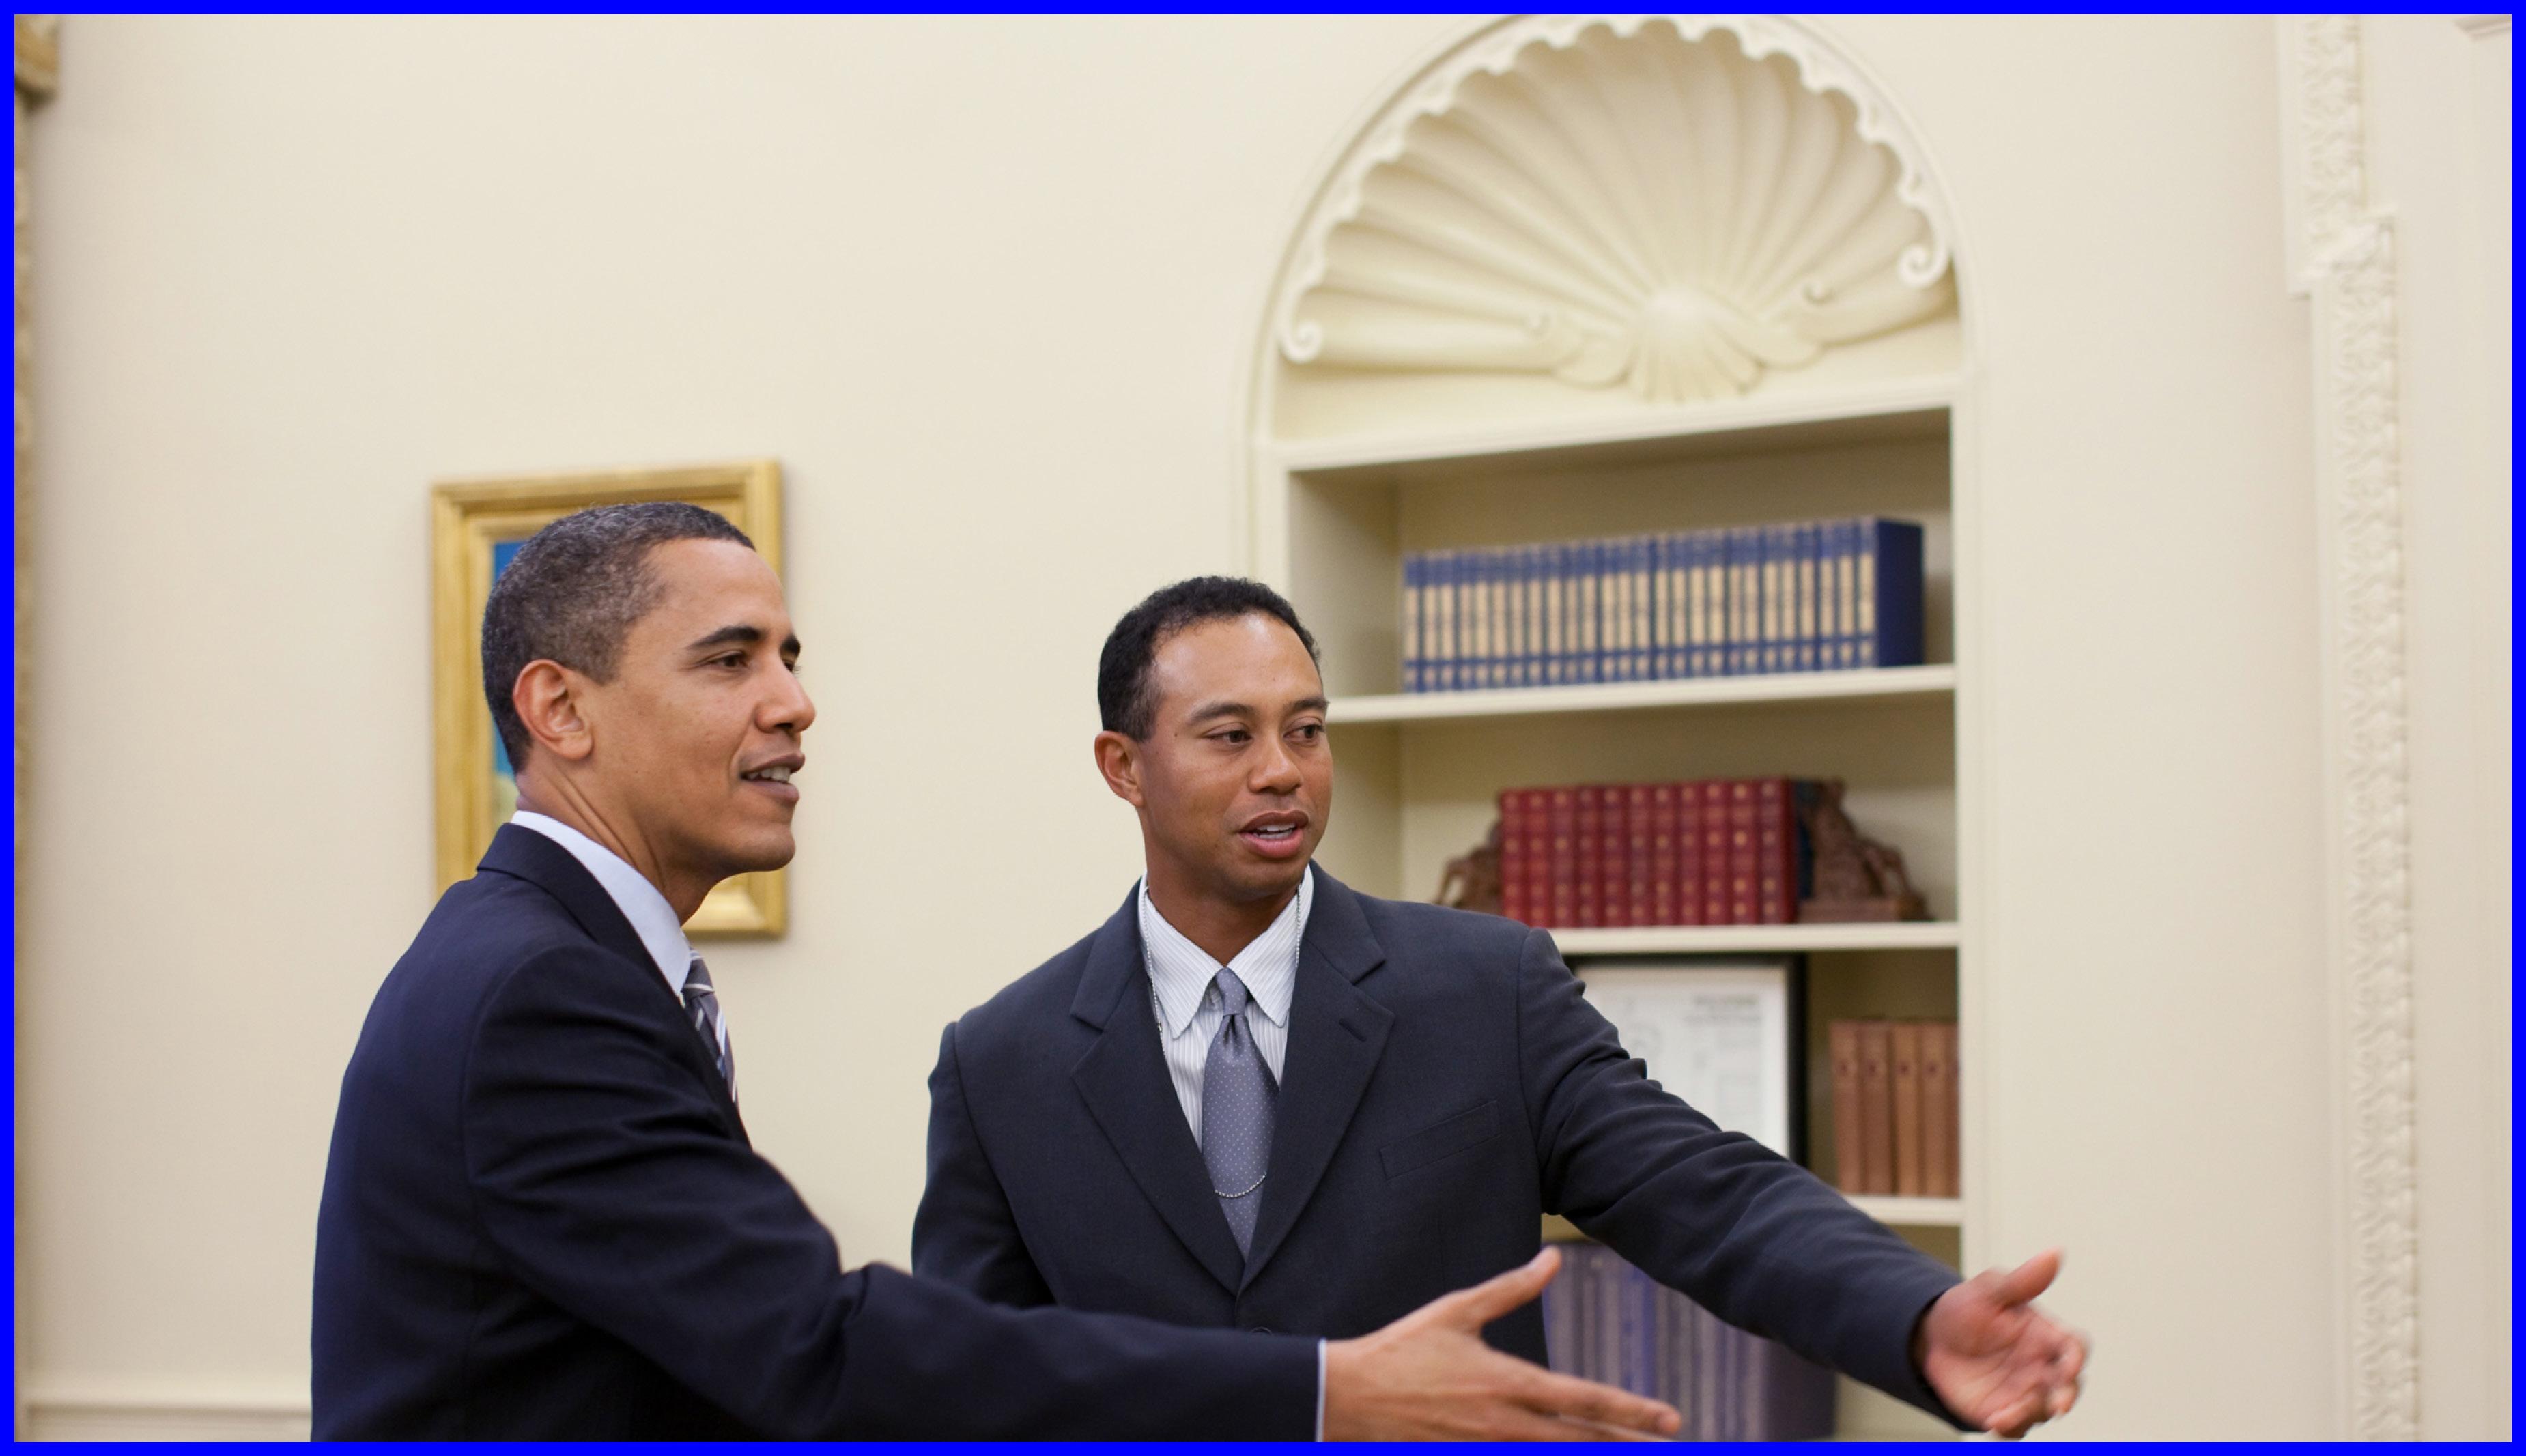 Woods & Obama